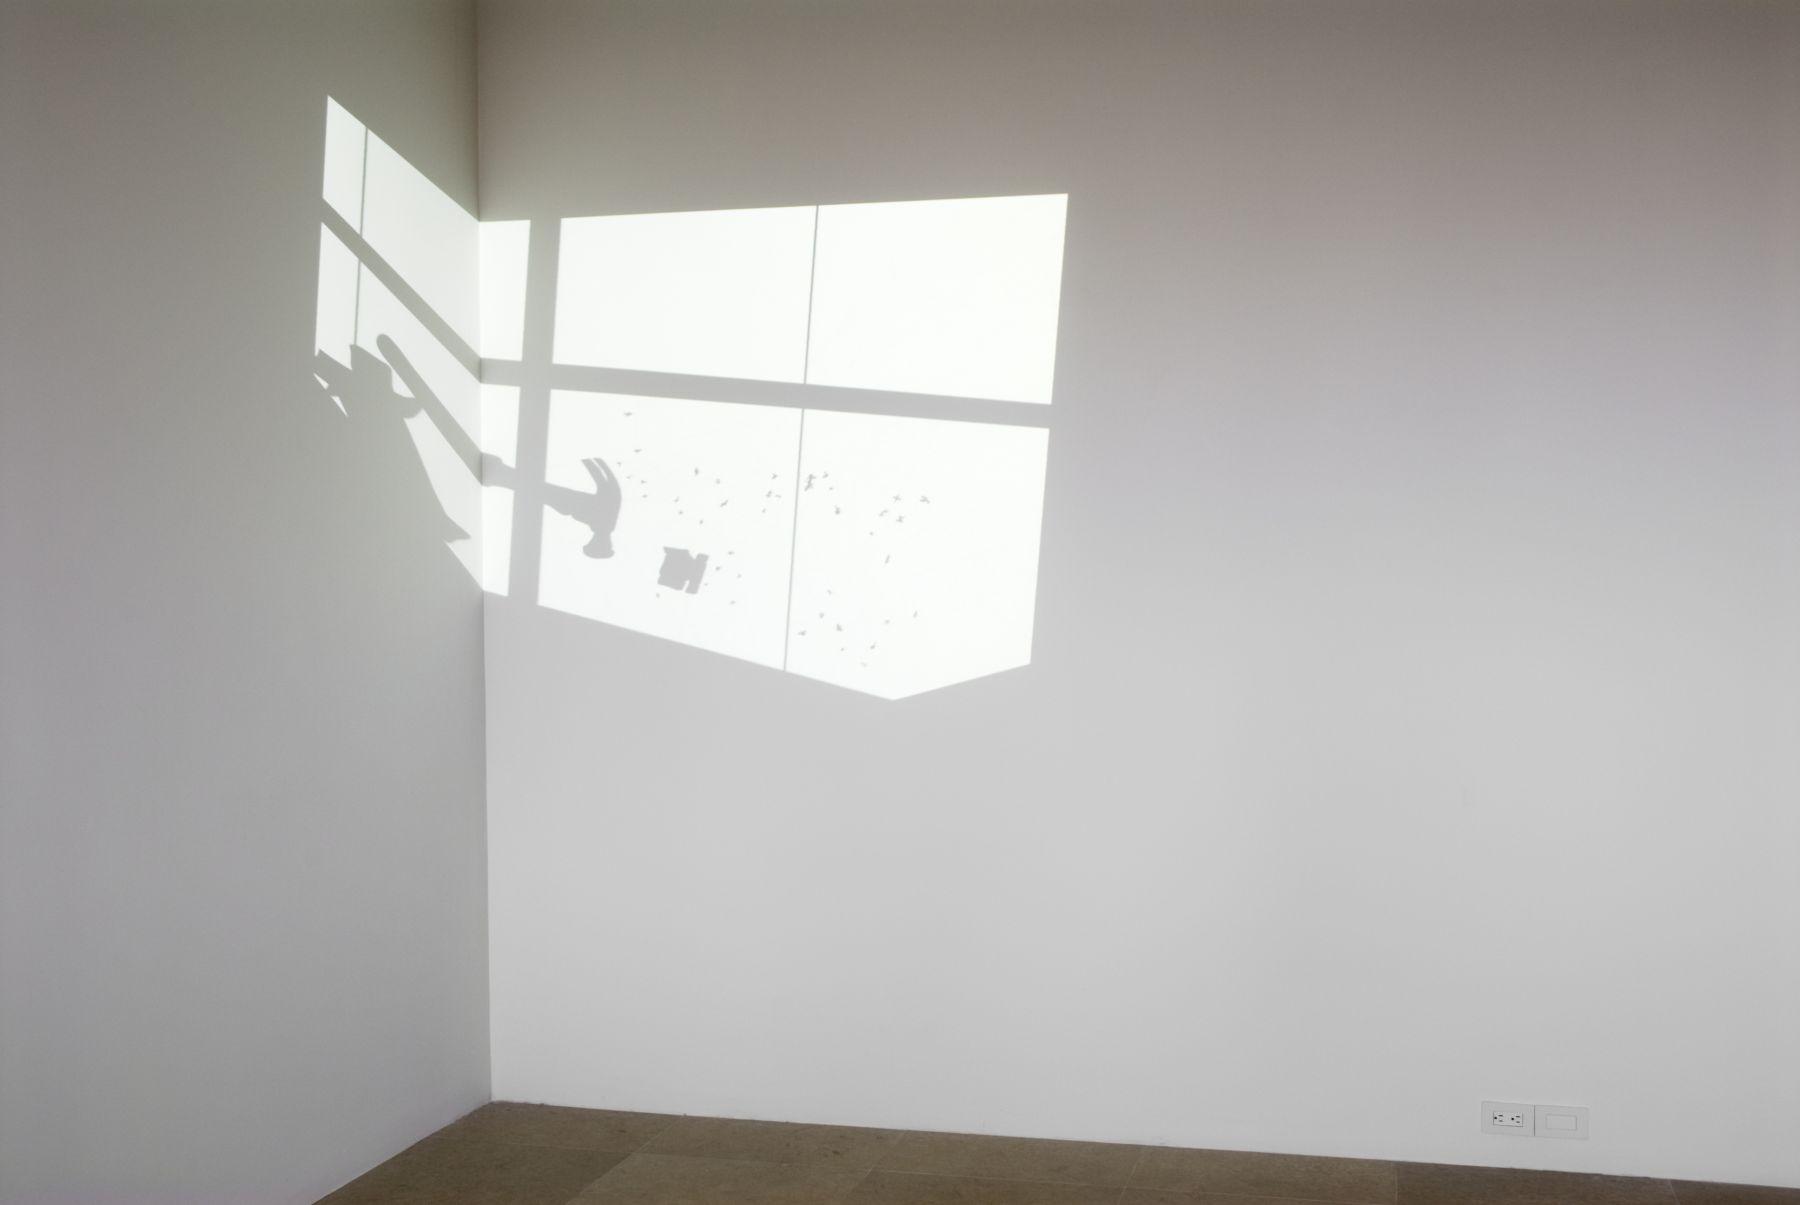 4th Light, 2006, digital video projection